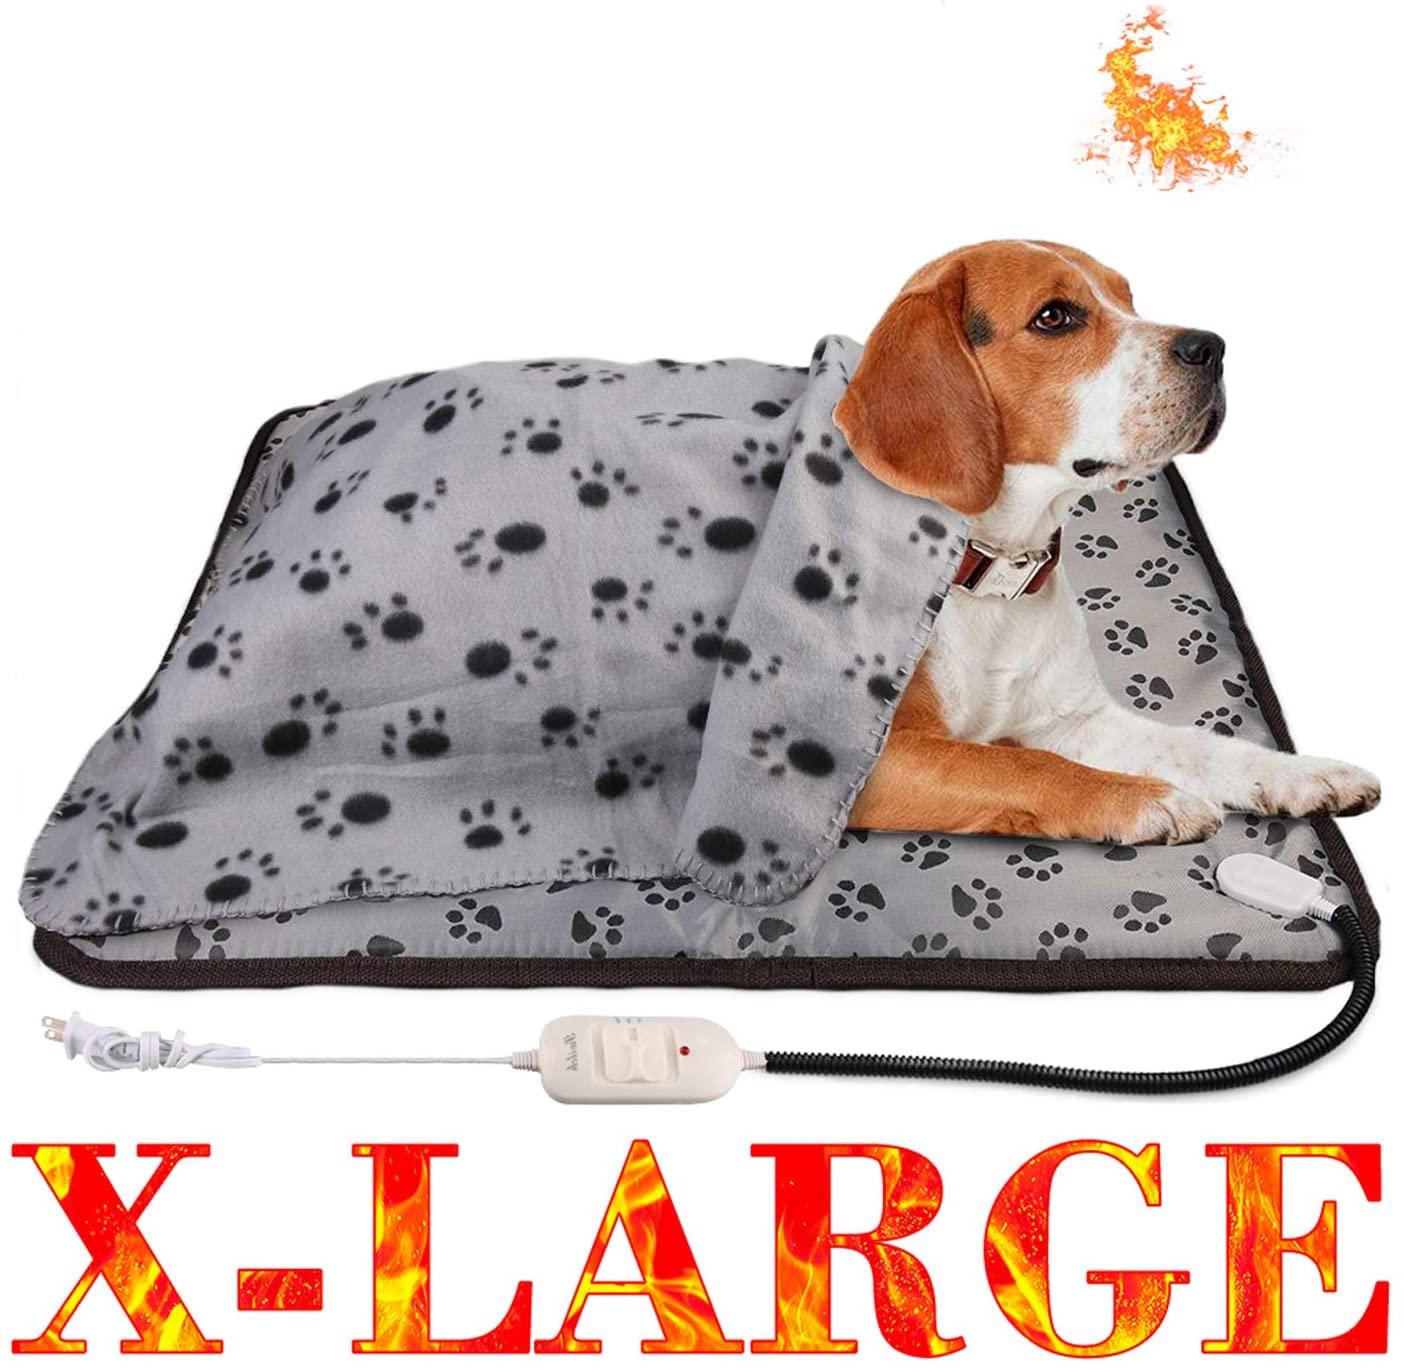 wangstar 2pcs Electric Pet Heat Pad 28x23.6, Heat Mat Pet Dog Cat Pets Heating Pad Temperature Adjustable Waterproof Chew Resistant Pet Heated Mat (28x23.6, X-Large Heating Pad)